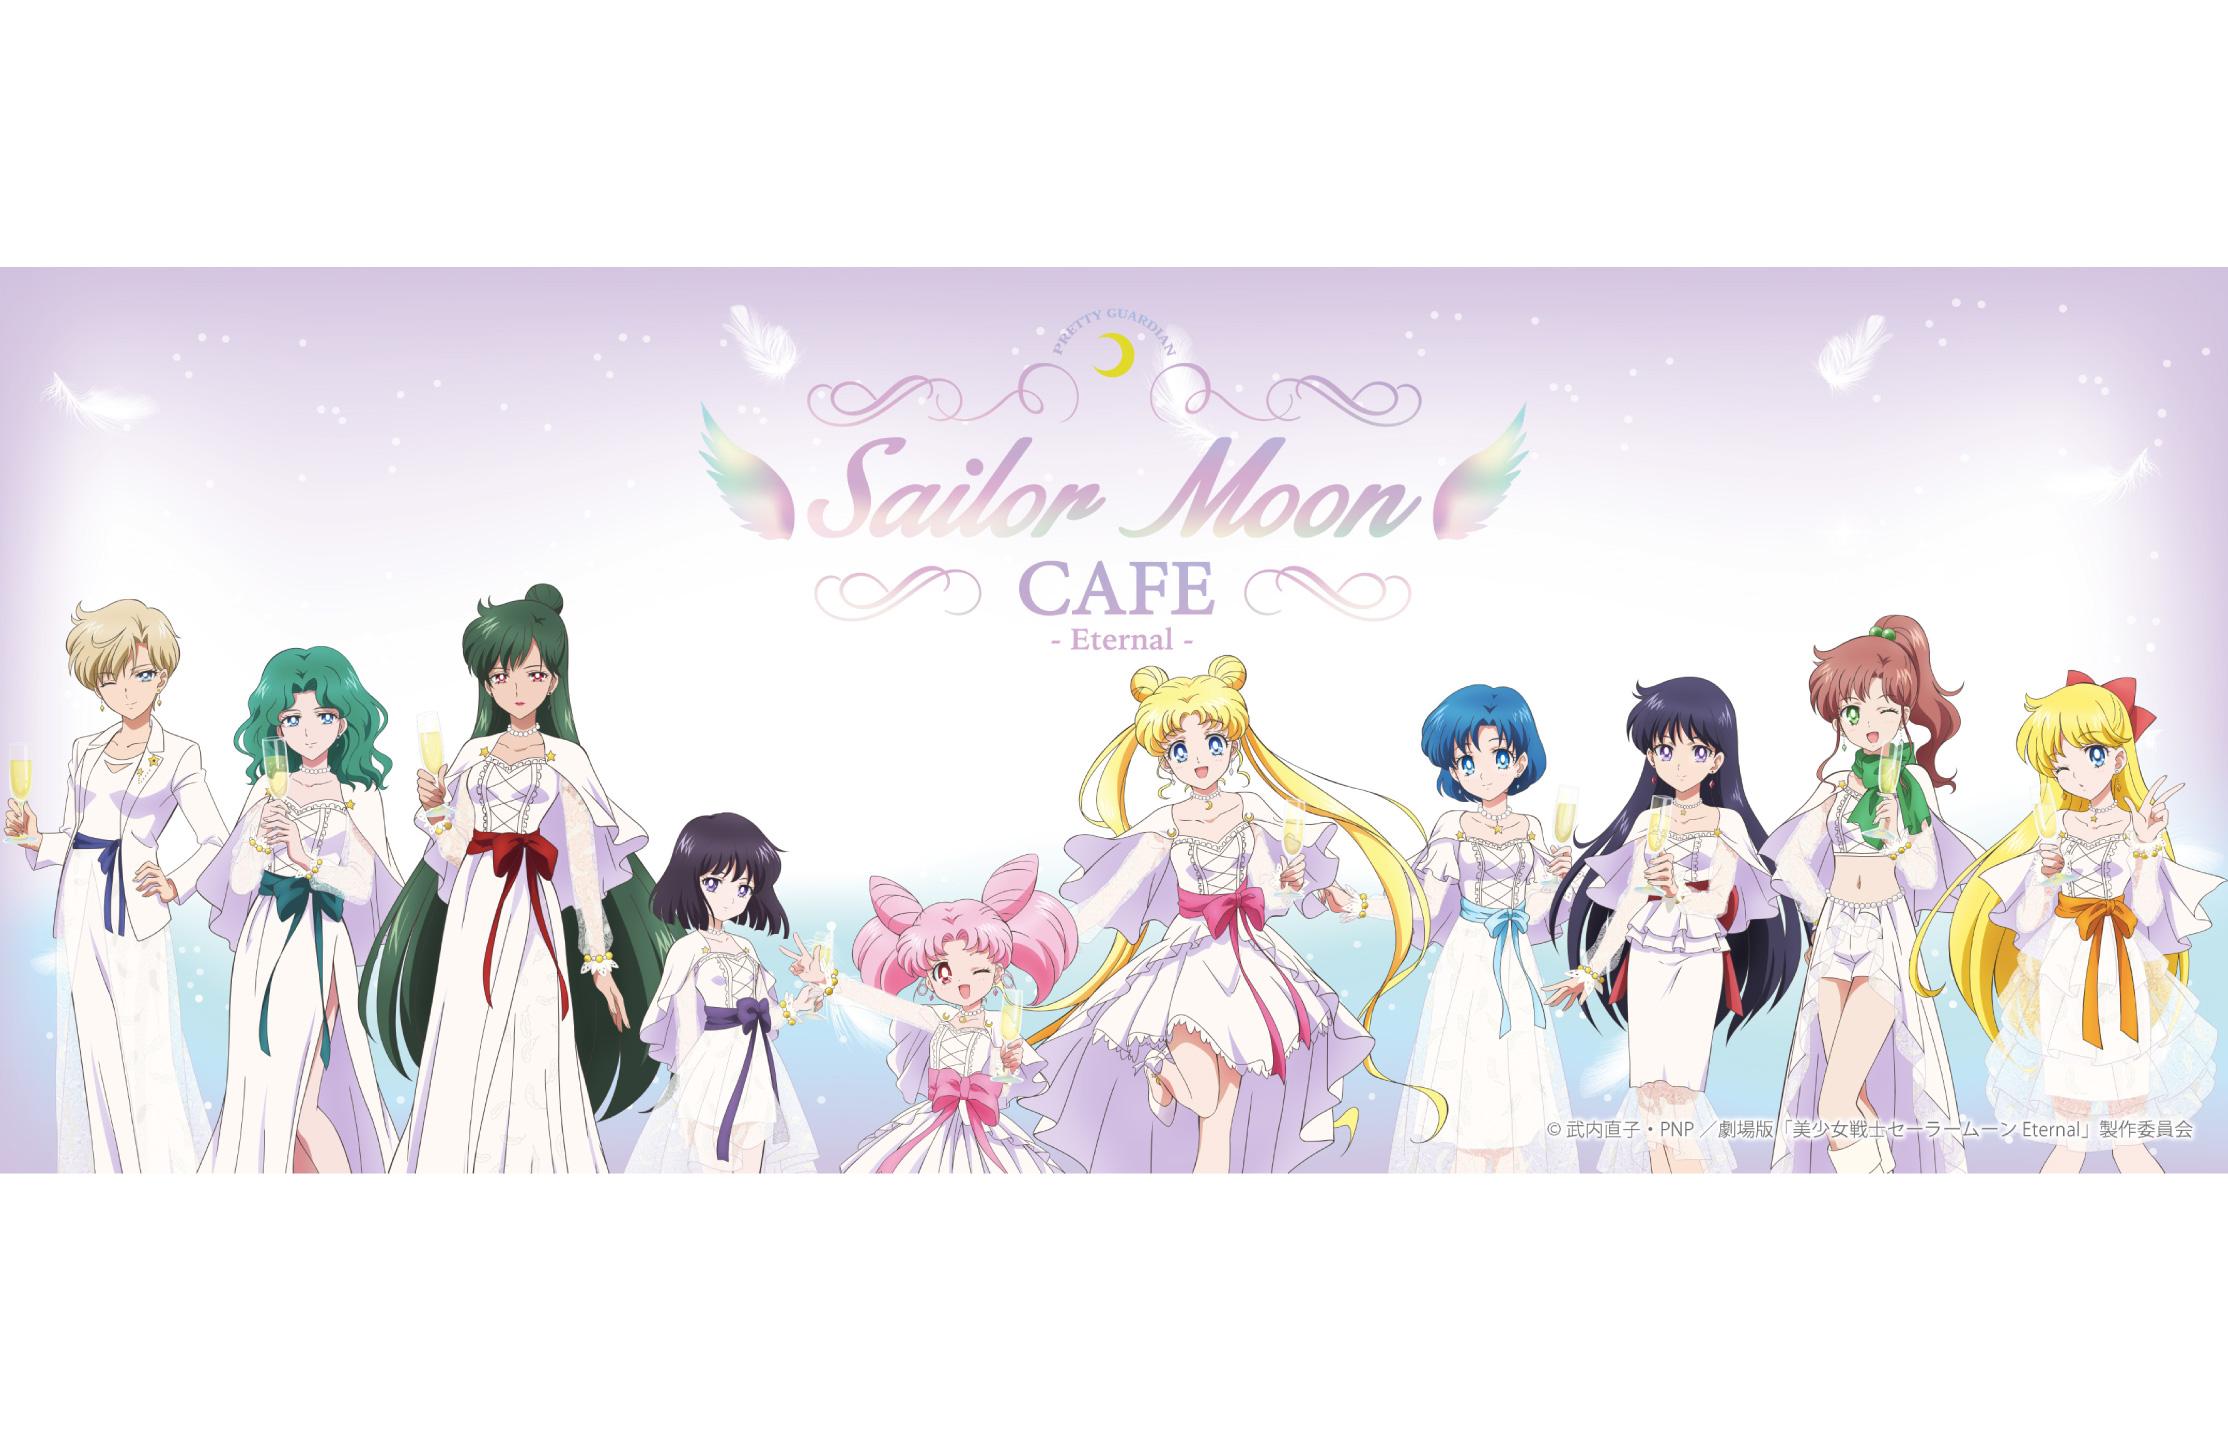 美少女戦士-劇場版-セーラームーンSailor-Moon-Café